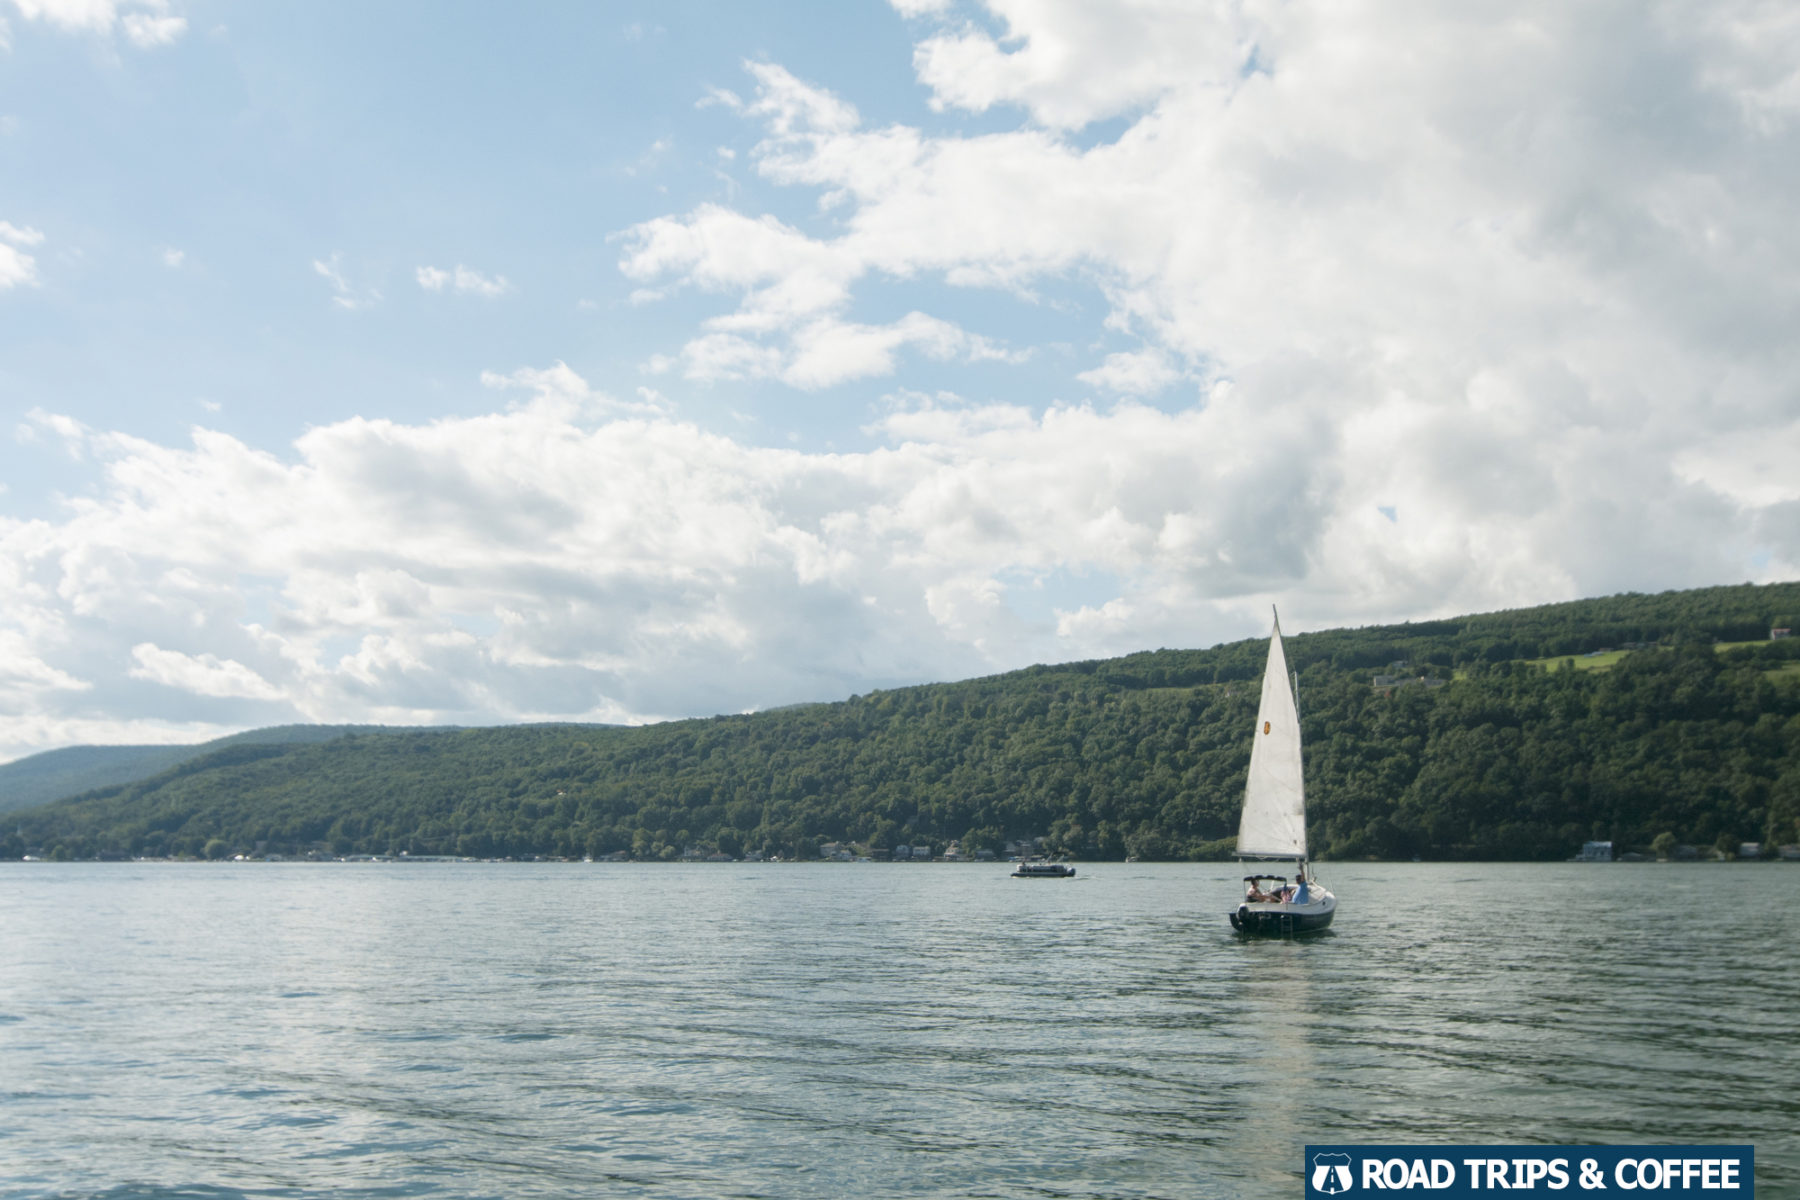 A single sailboat on the large Keuka Lake in Hammondsport, New York